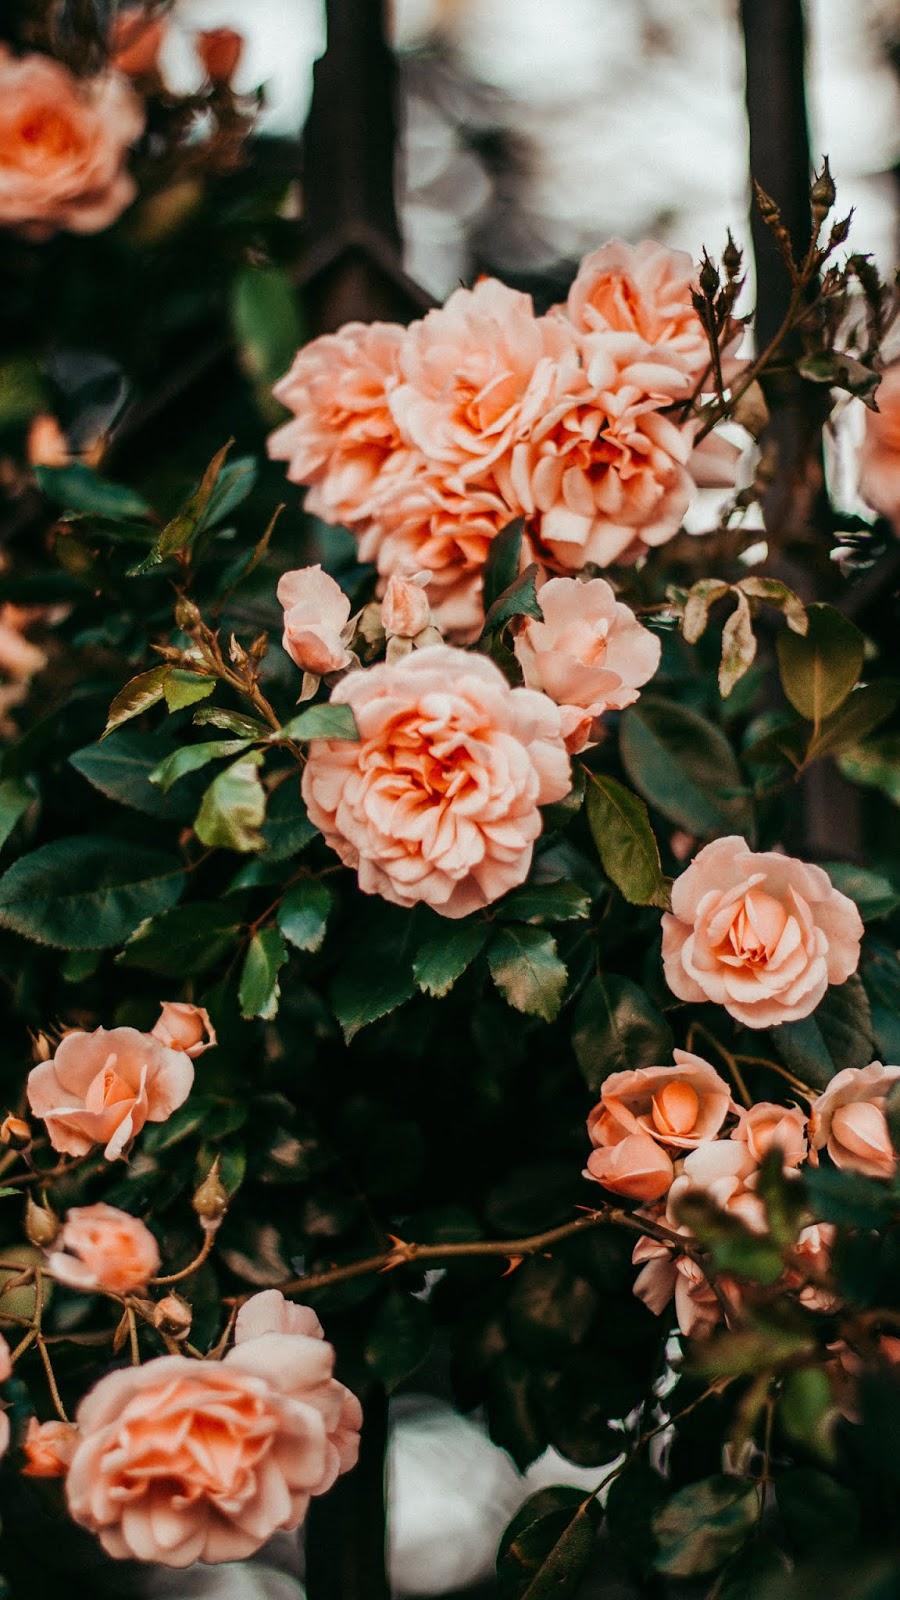 Hoa hồng màu cam